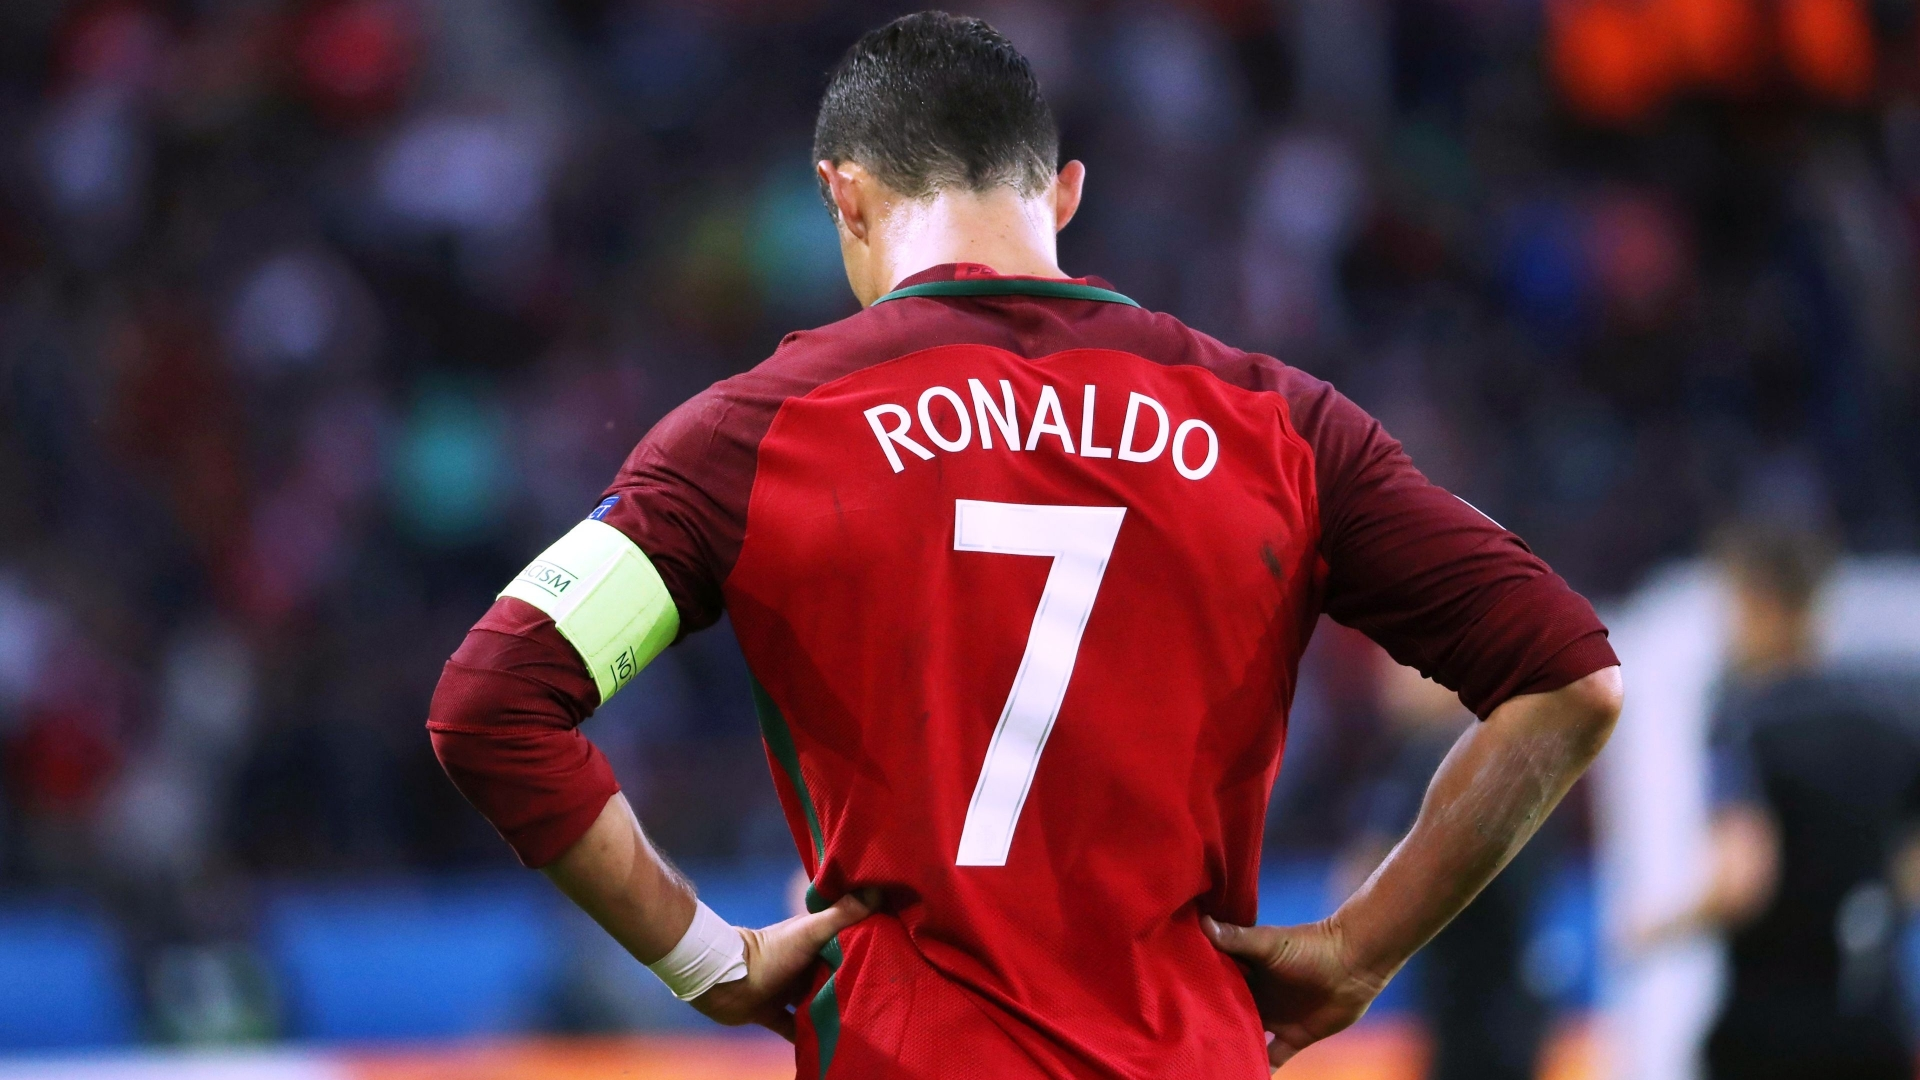 25+ Cristiano Ronaldo UHD Wallpapers on WallpaperSafari